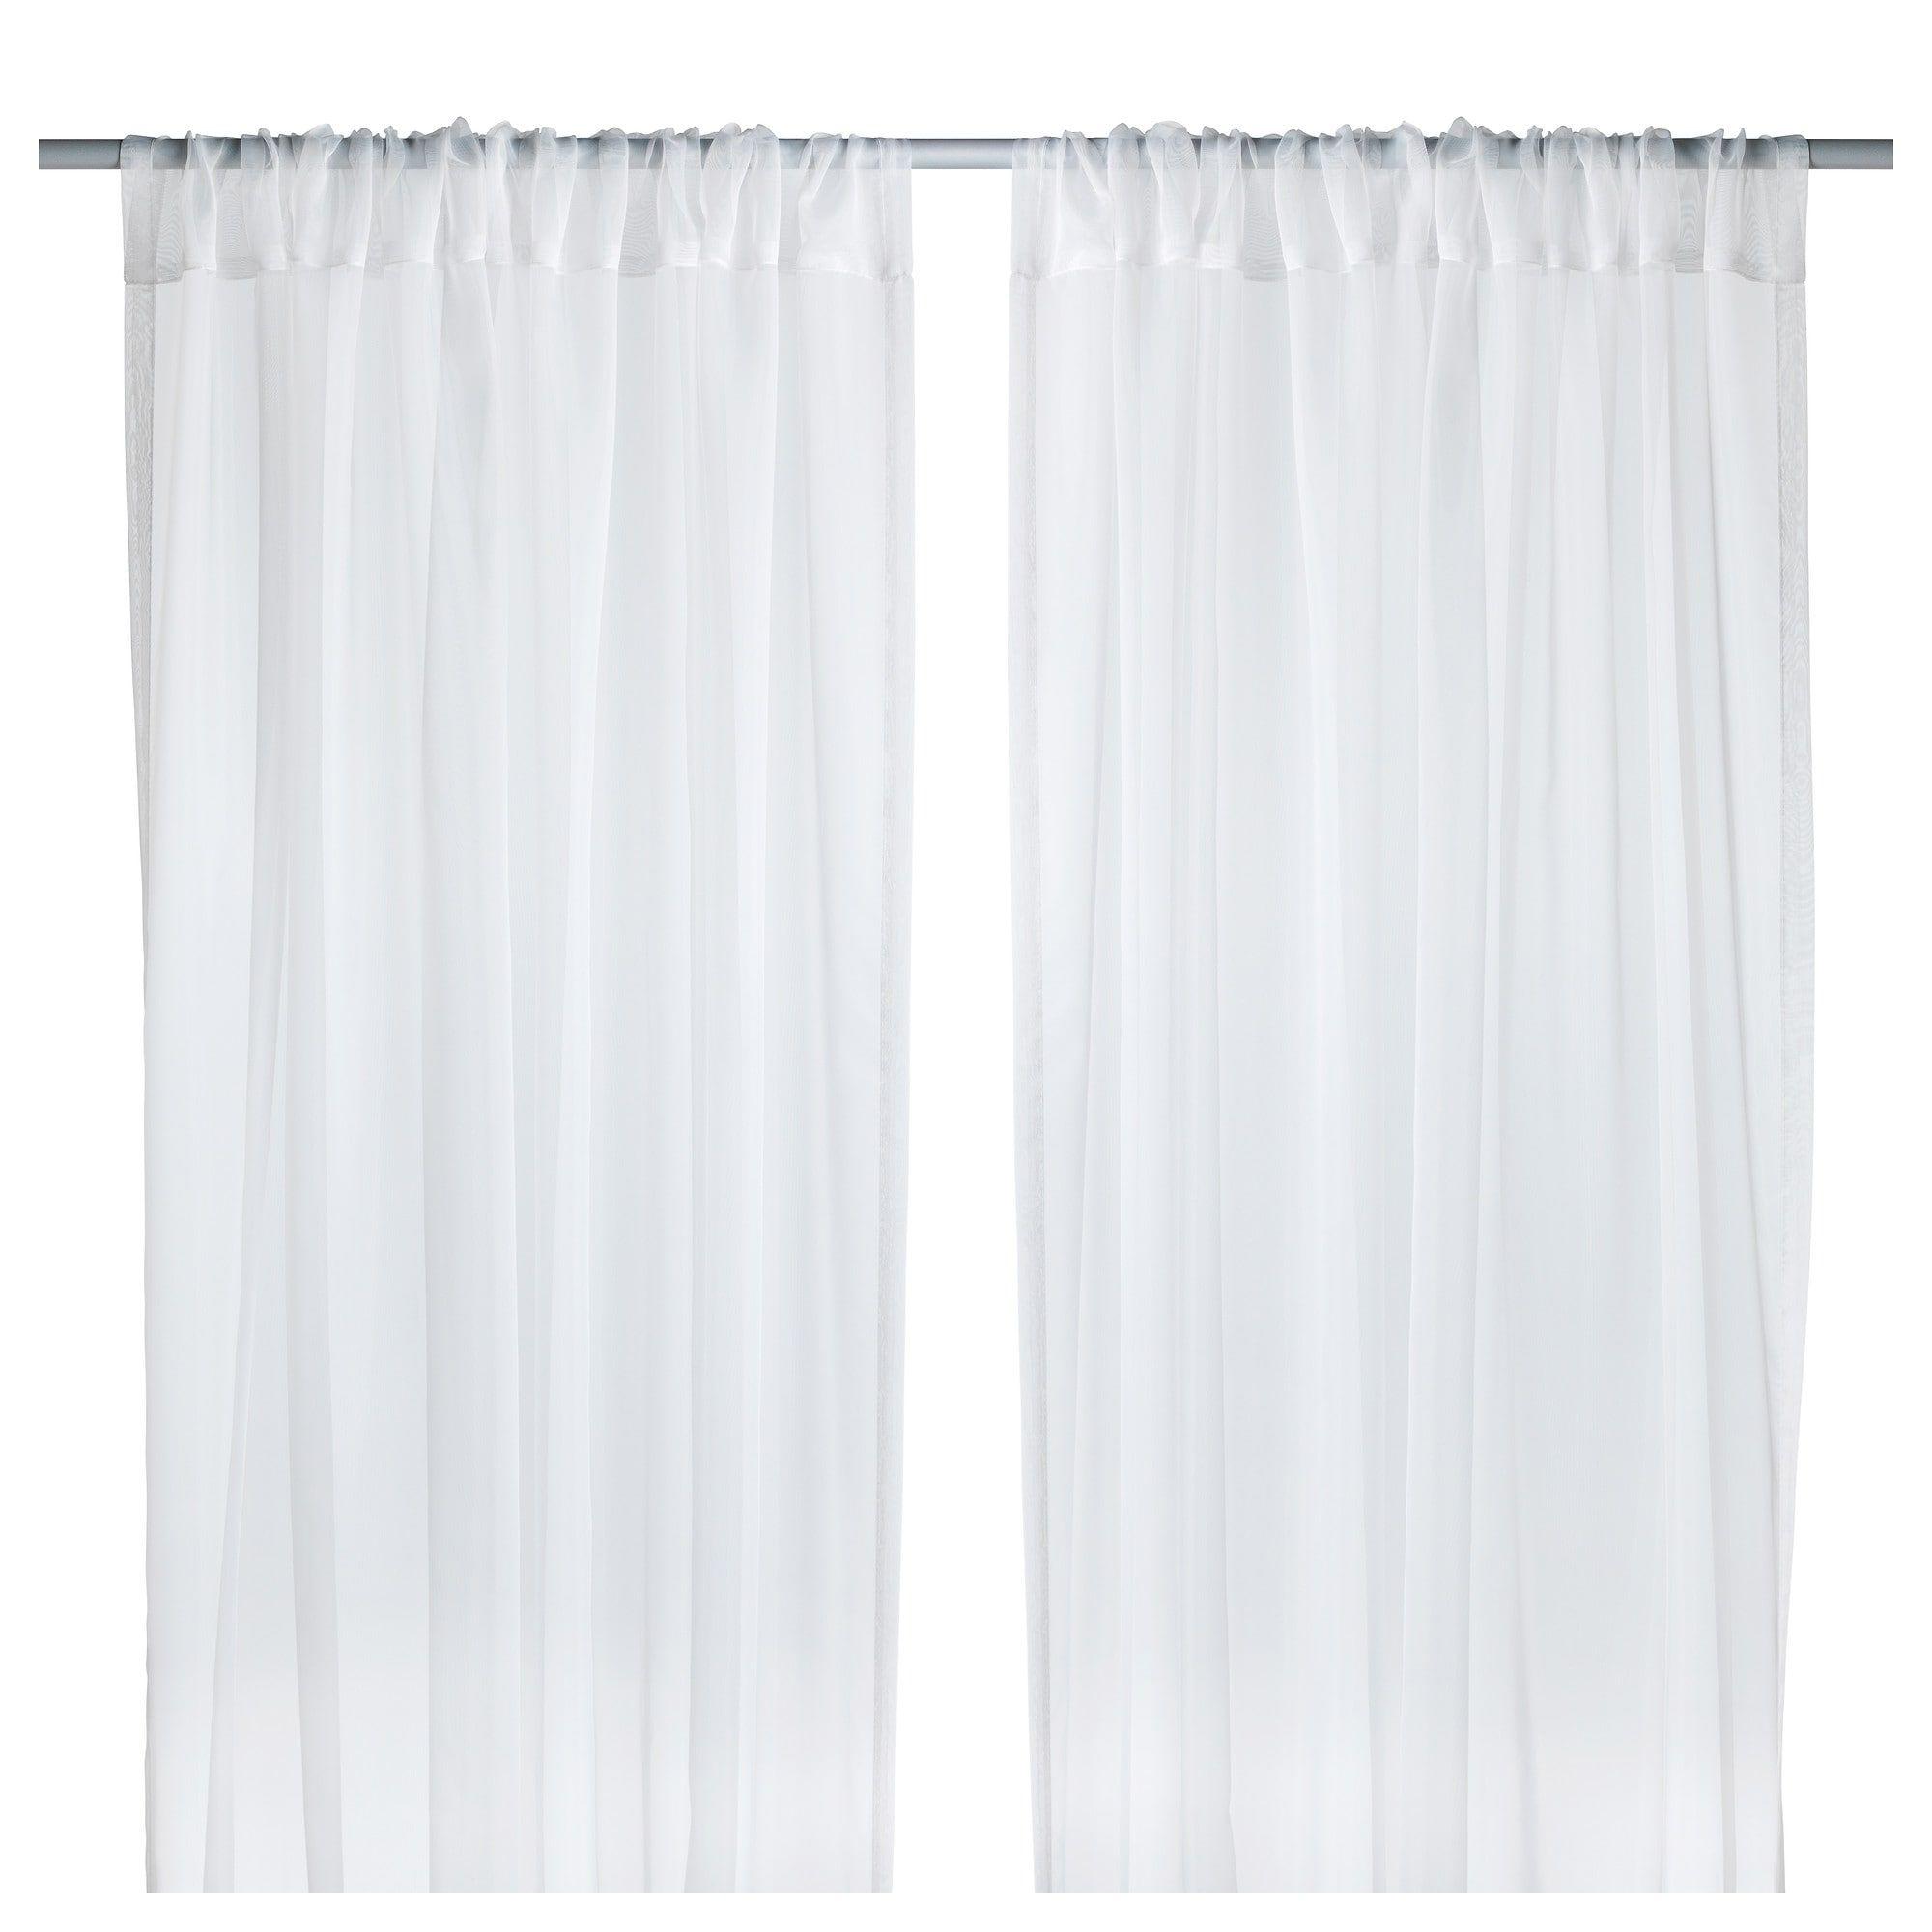 TERESIA Sheer curtains 1 pair white  Wishlist